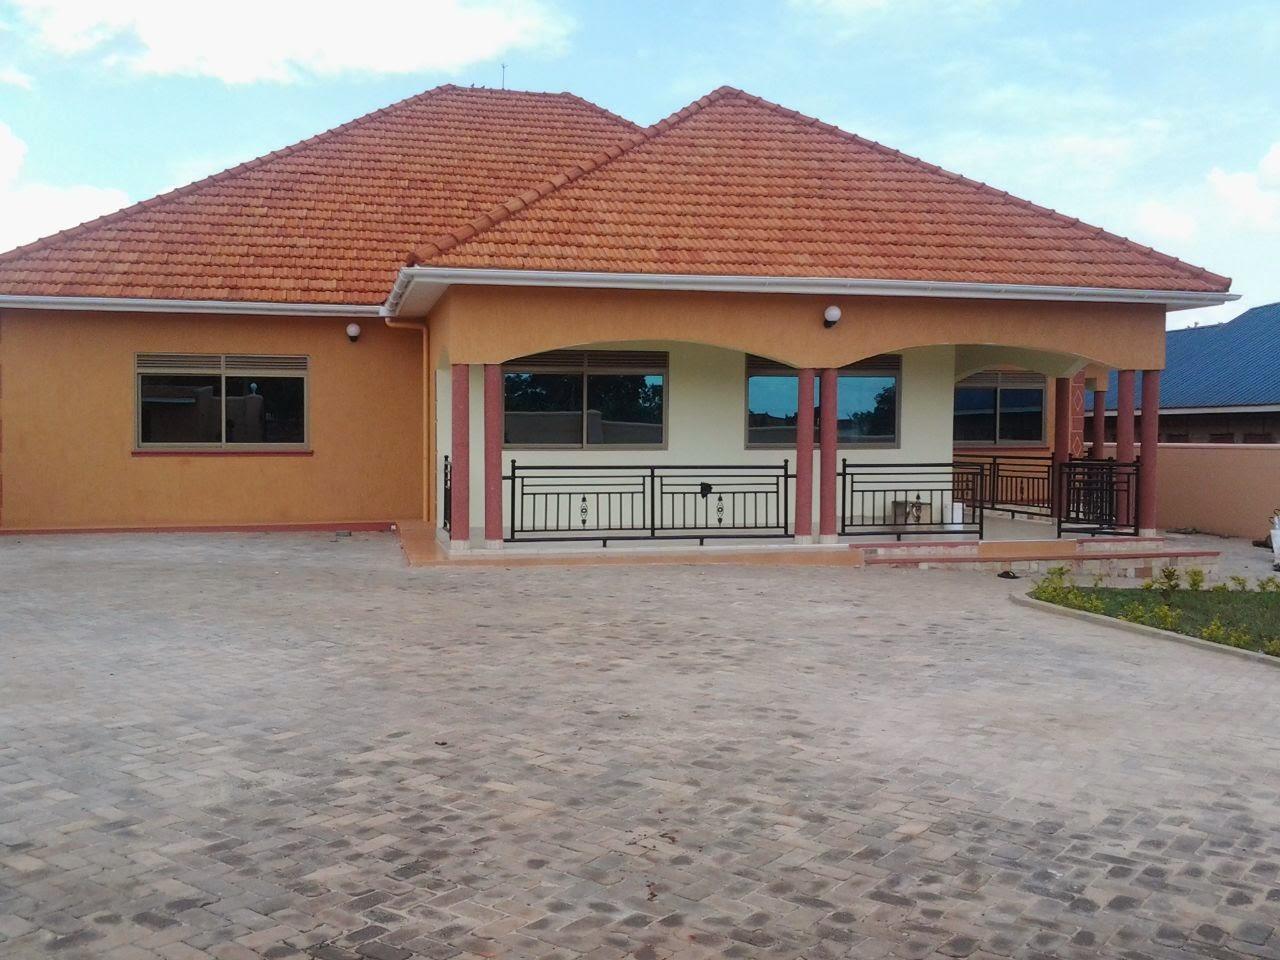 HOUSES FOR SALE KAMPALA, UGANDA: HOUSE FOR SALE BUWATE